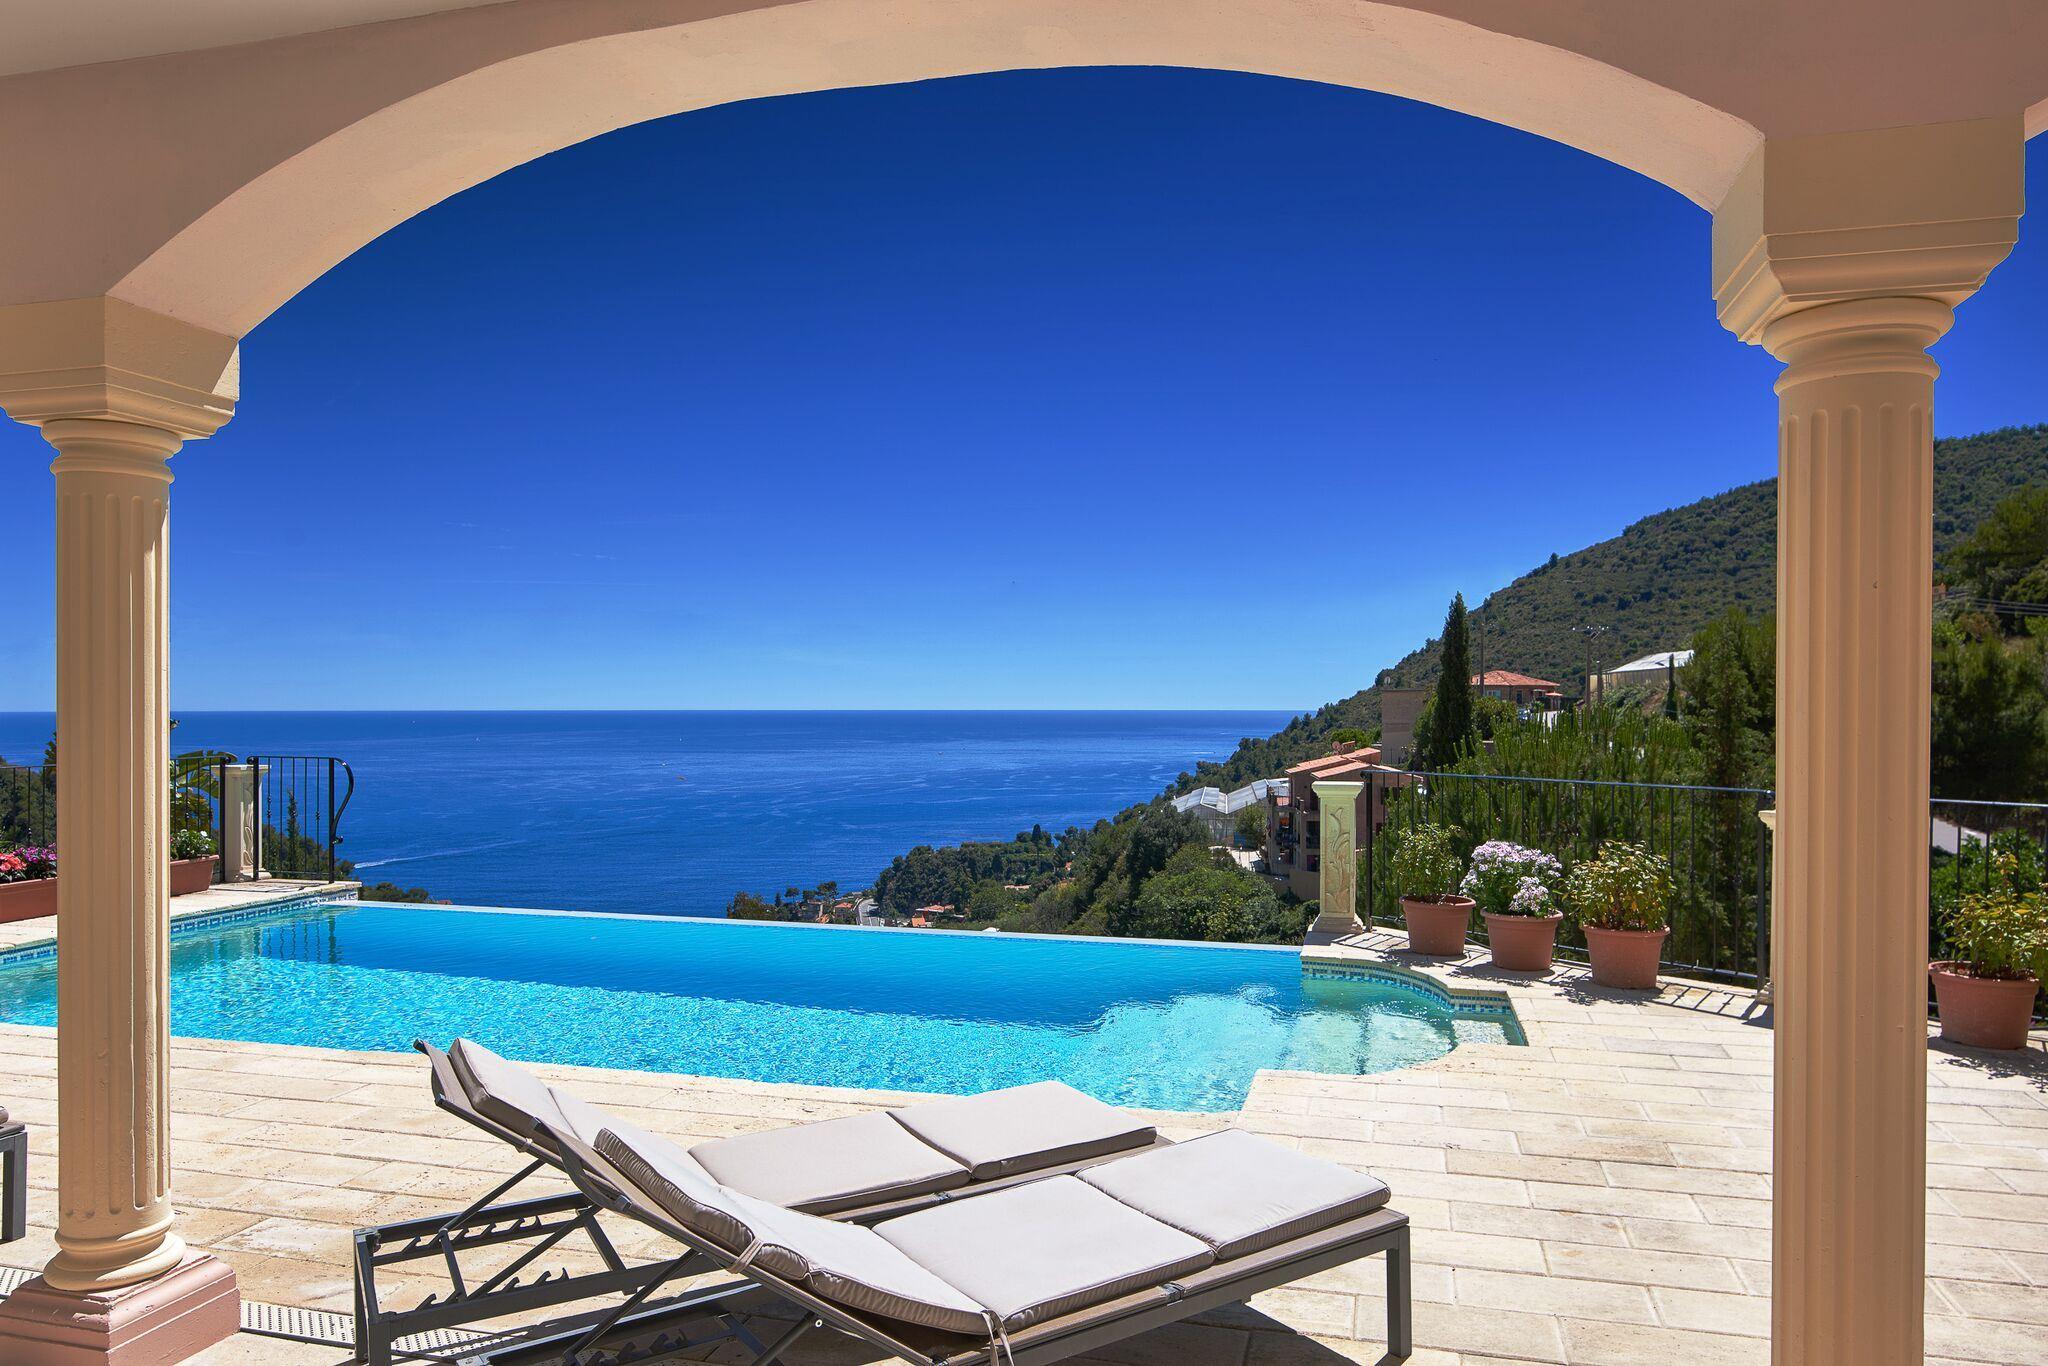 Single Family Home for Sale at Provencal style villa - sea views Eze, Provence-Alpes-Cote D'Azur, 06360 France